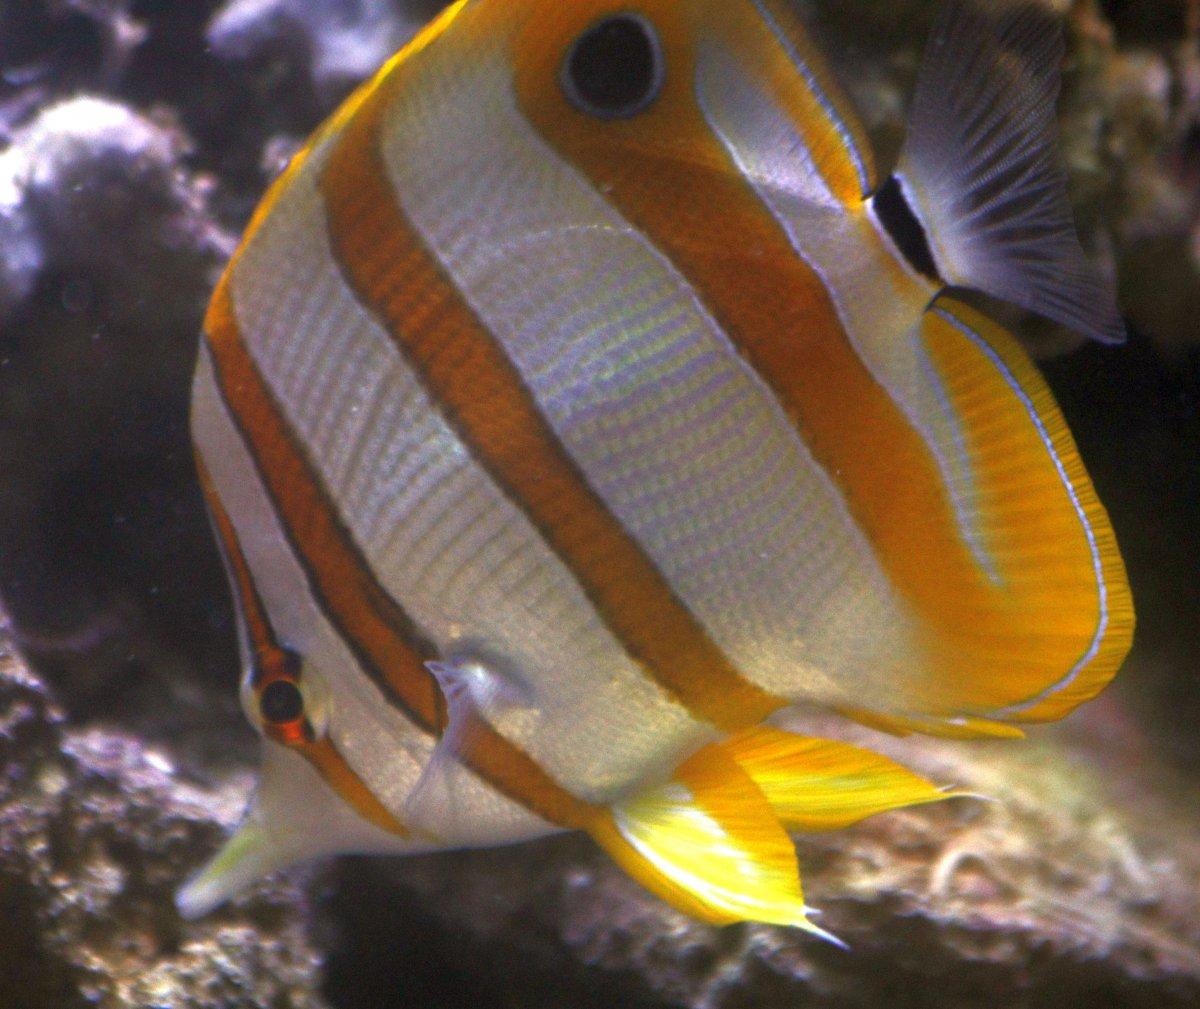 ourbutterflyfish-10-12-2018.jpg